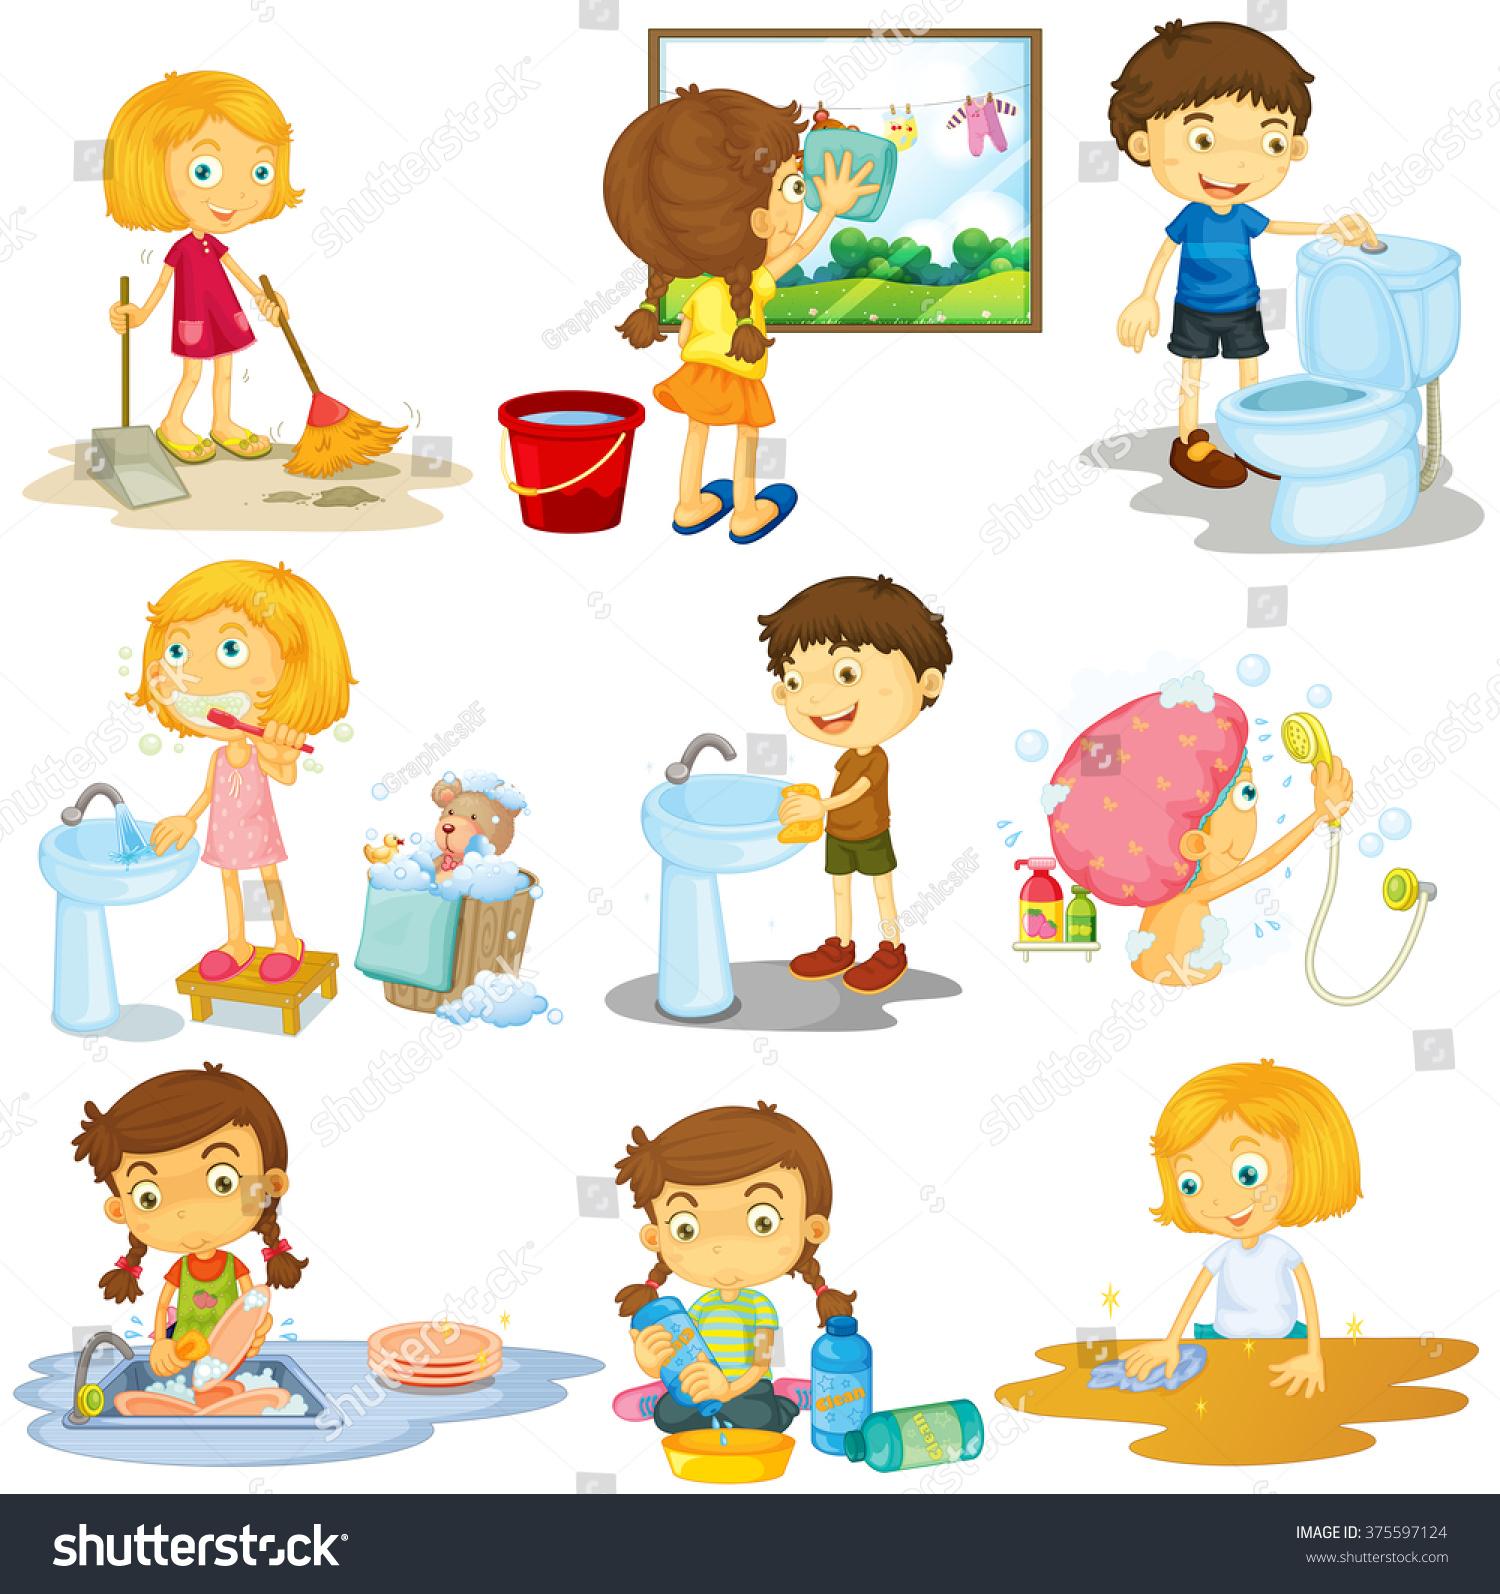 Children Doing Different Chores Illustration Stock Vector ...